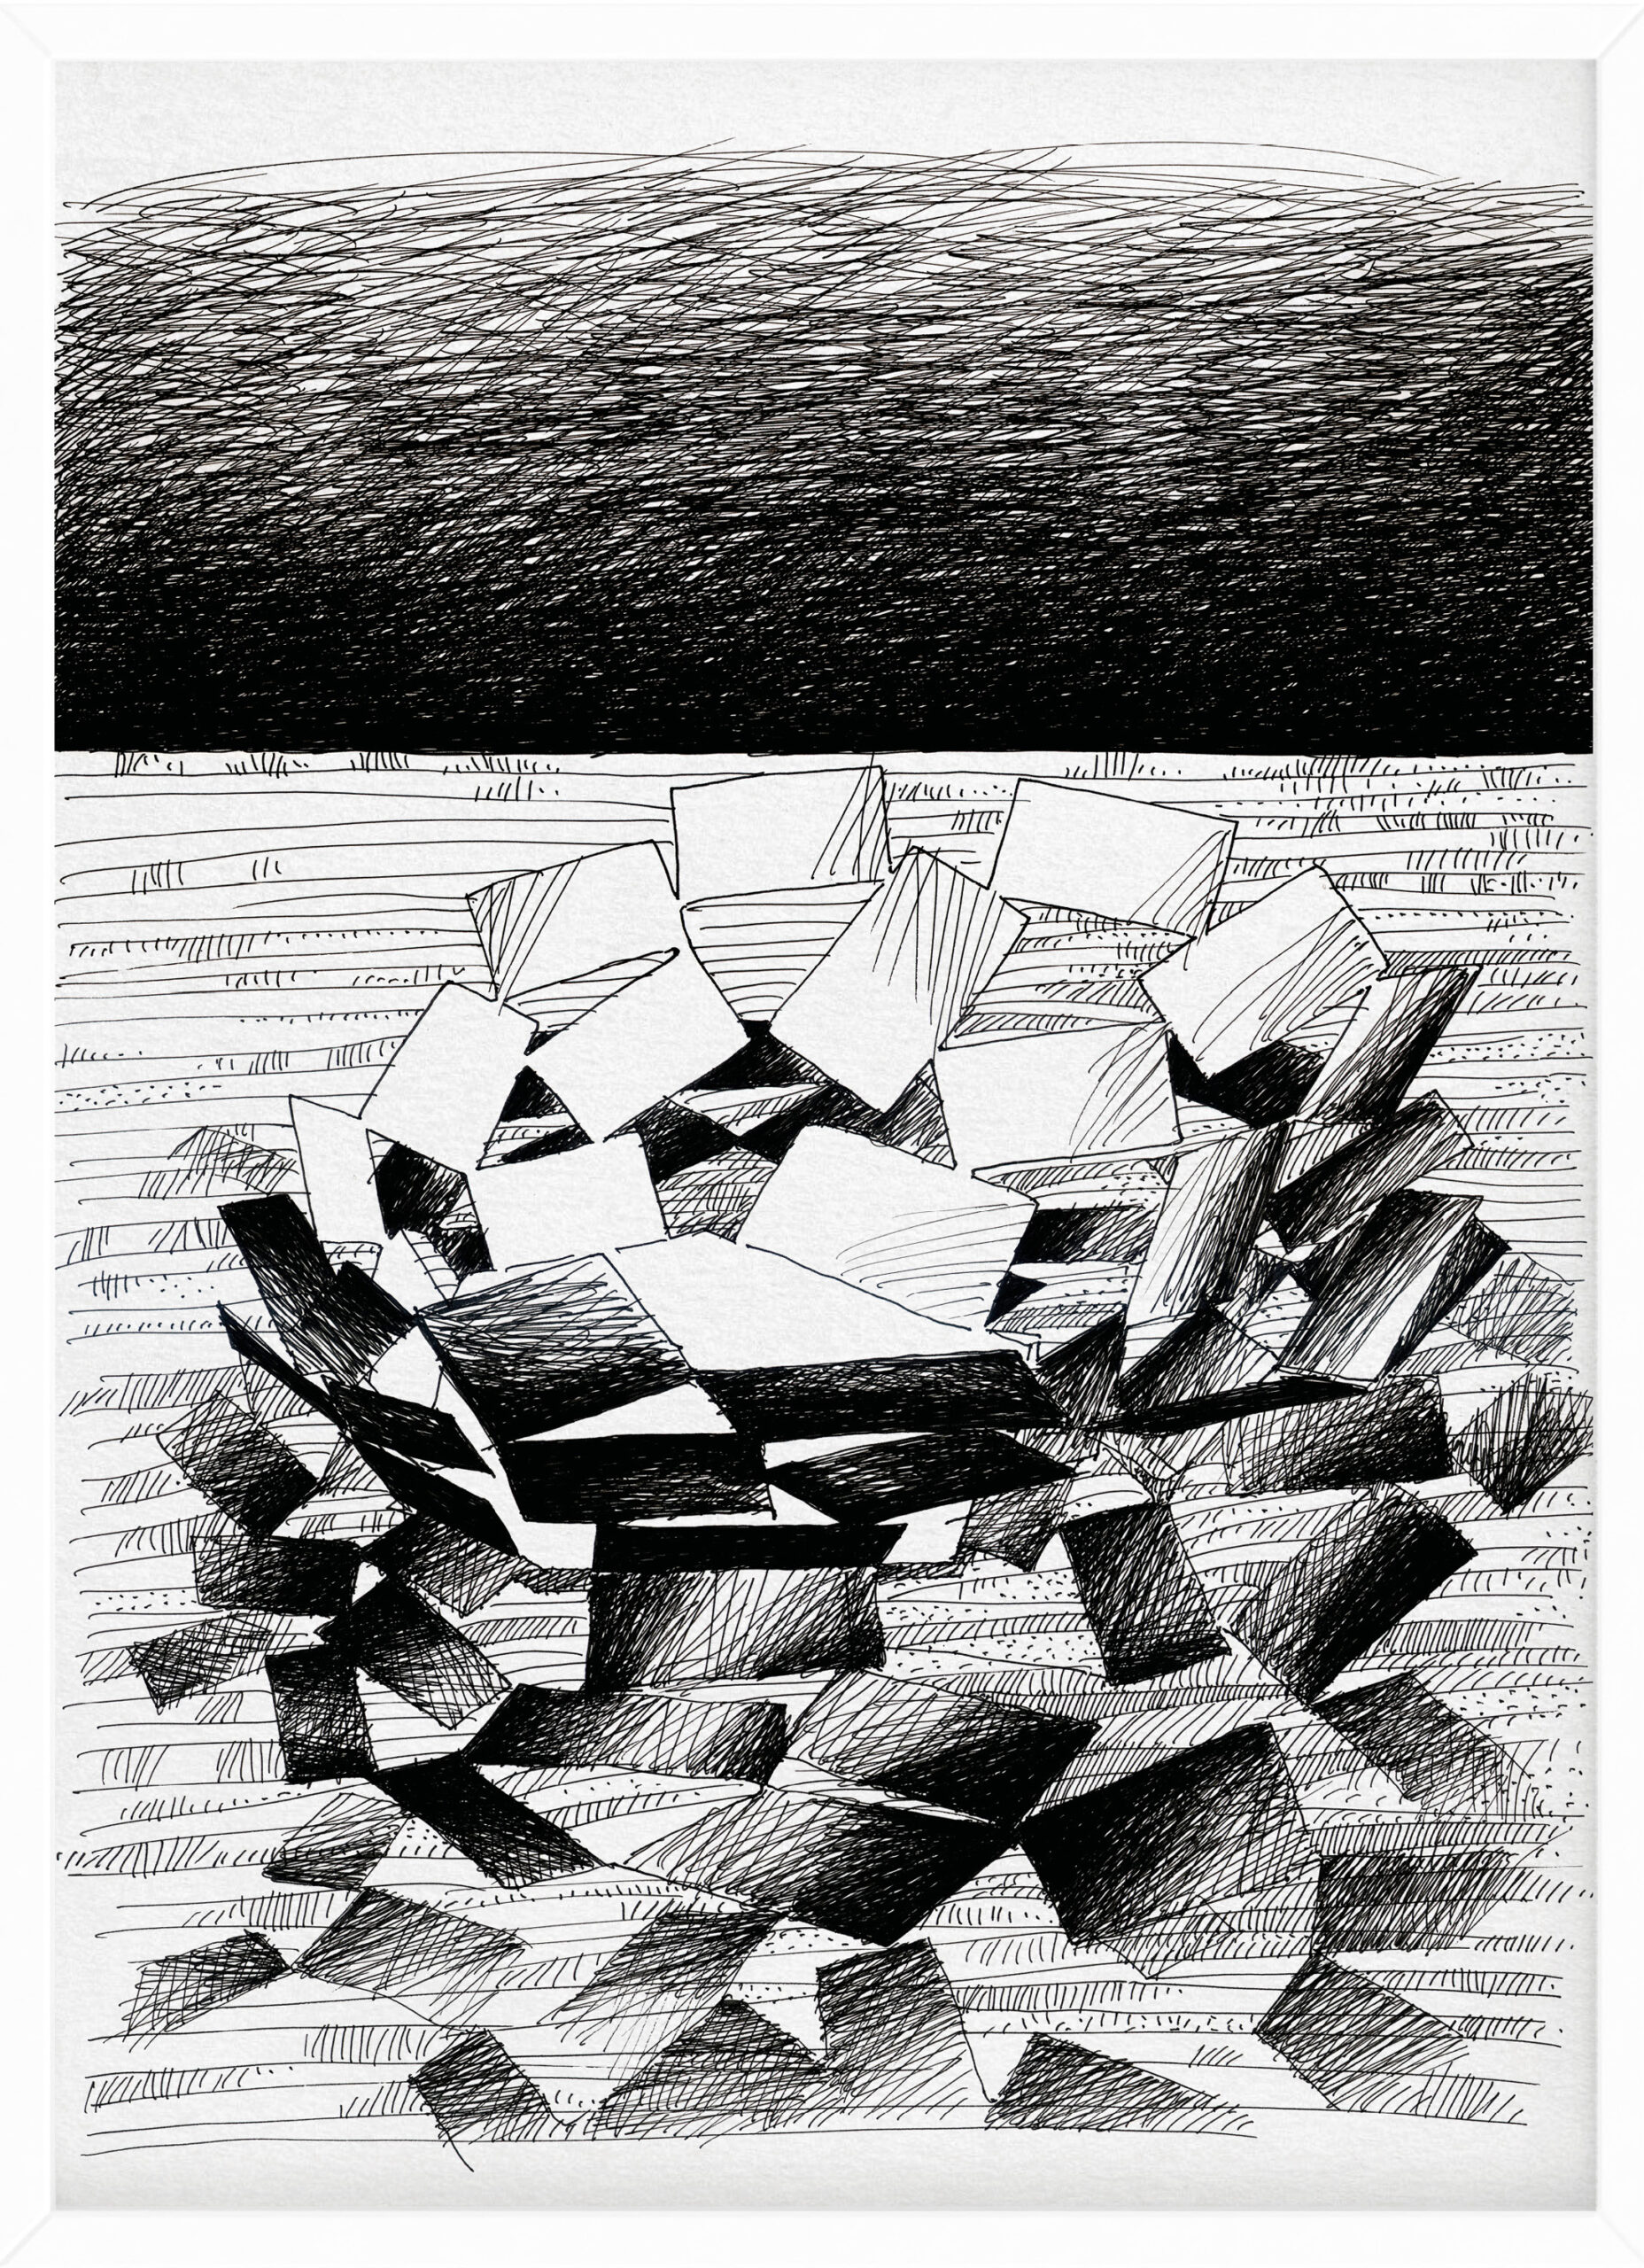 Radical | Drawings | Mario Trimarchi Design4